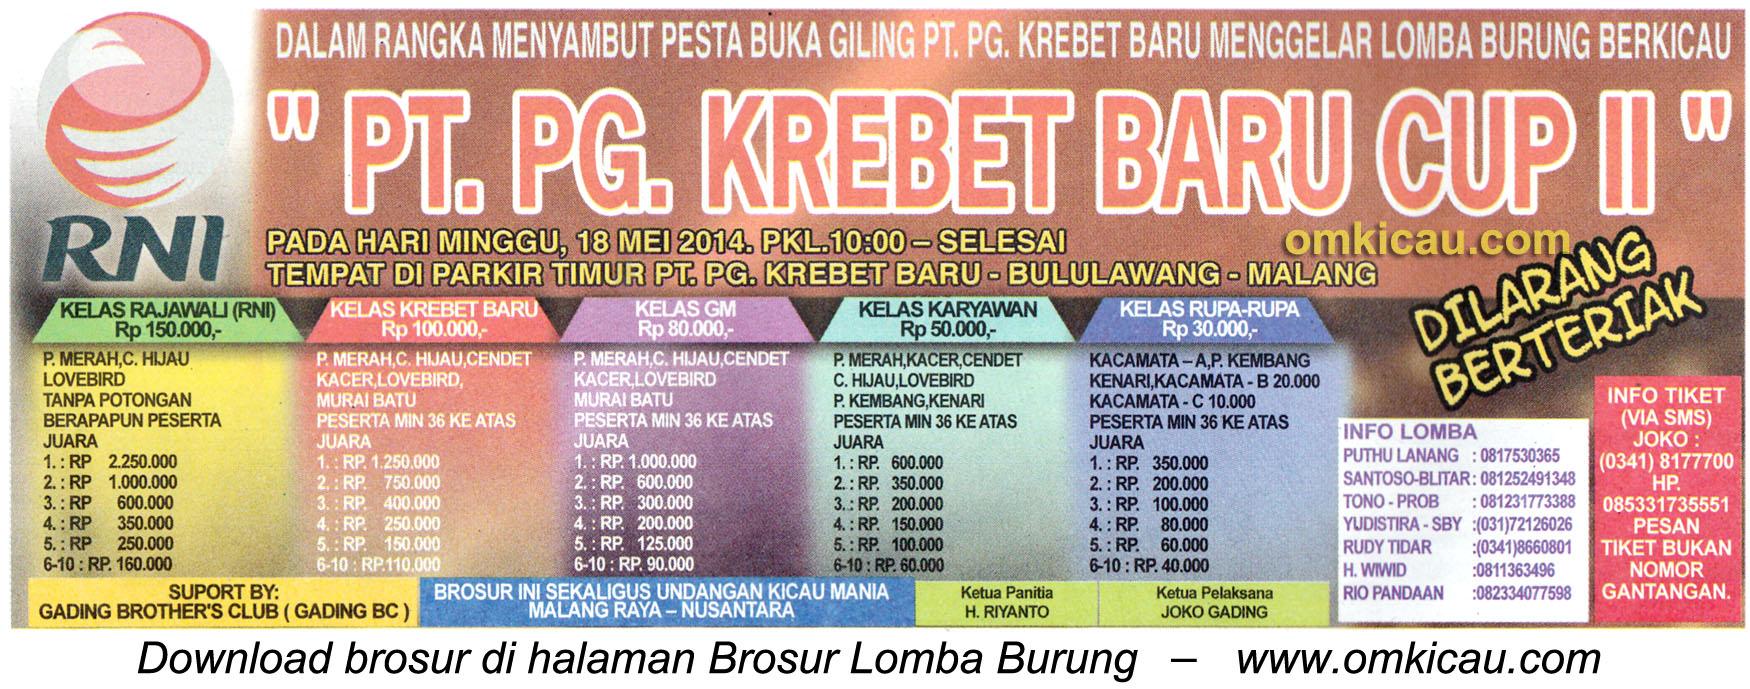 Brosur Lomba Burung Berkicau PG Krebet Baru Cup II, Malang, 18 Mei 2014